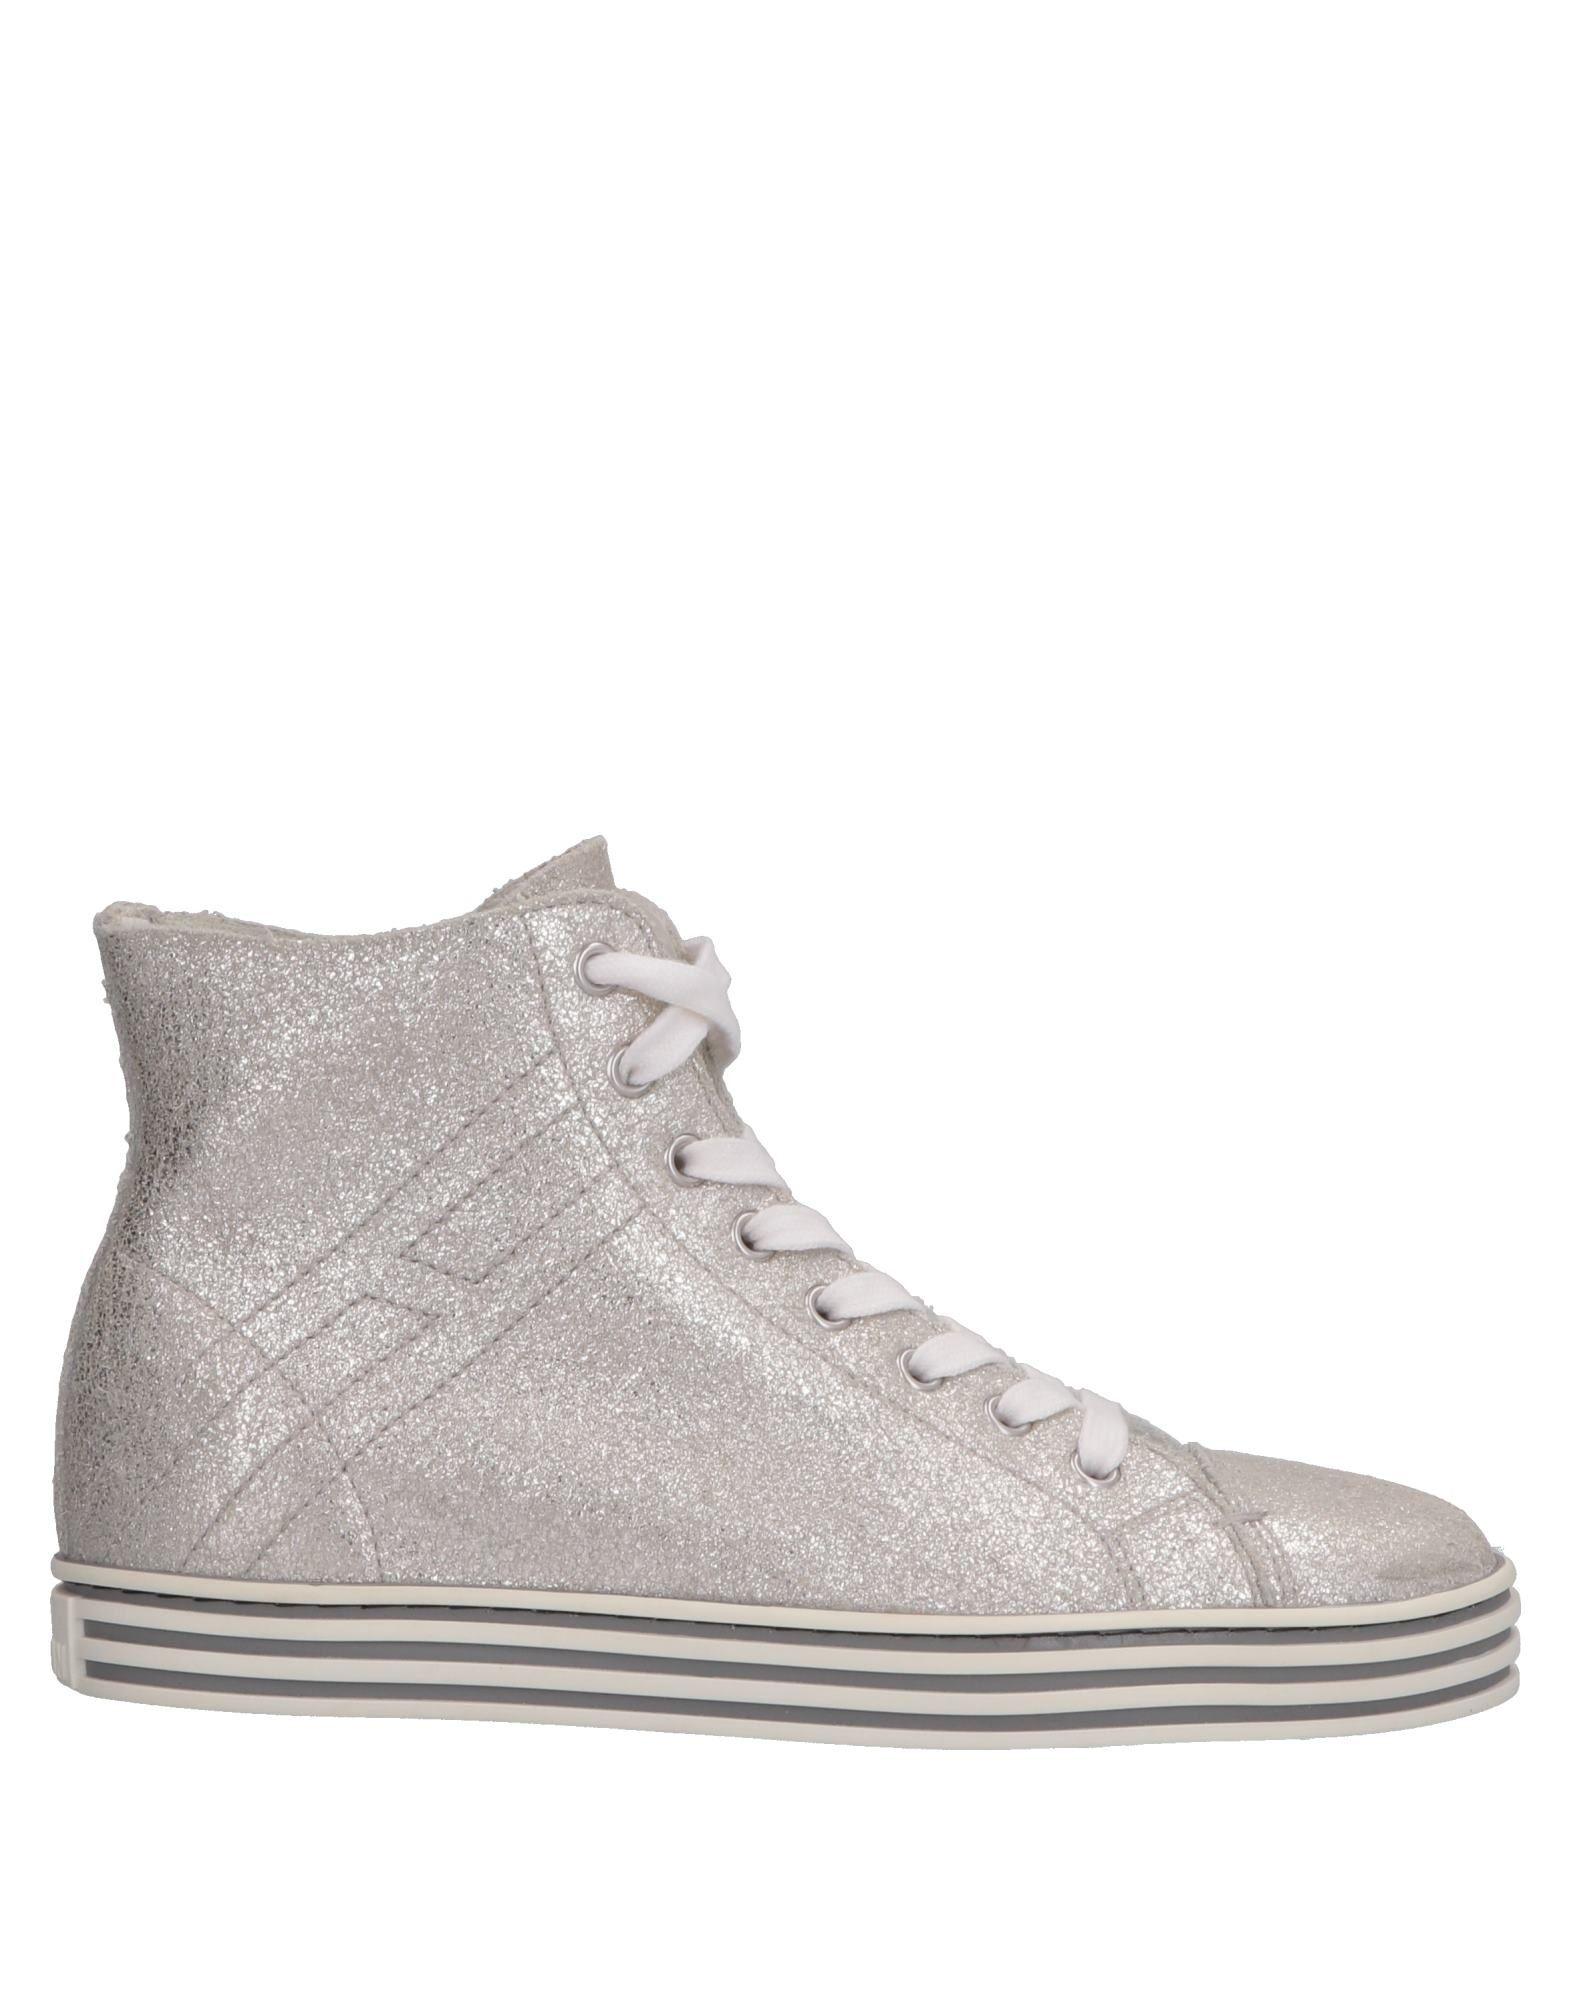 Stilvolle Sneakers billige Schuhe Hogan Rebel Sneakers Stilvolle Damen  11584823NH c5c267